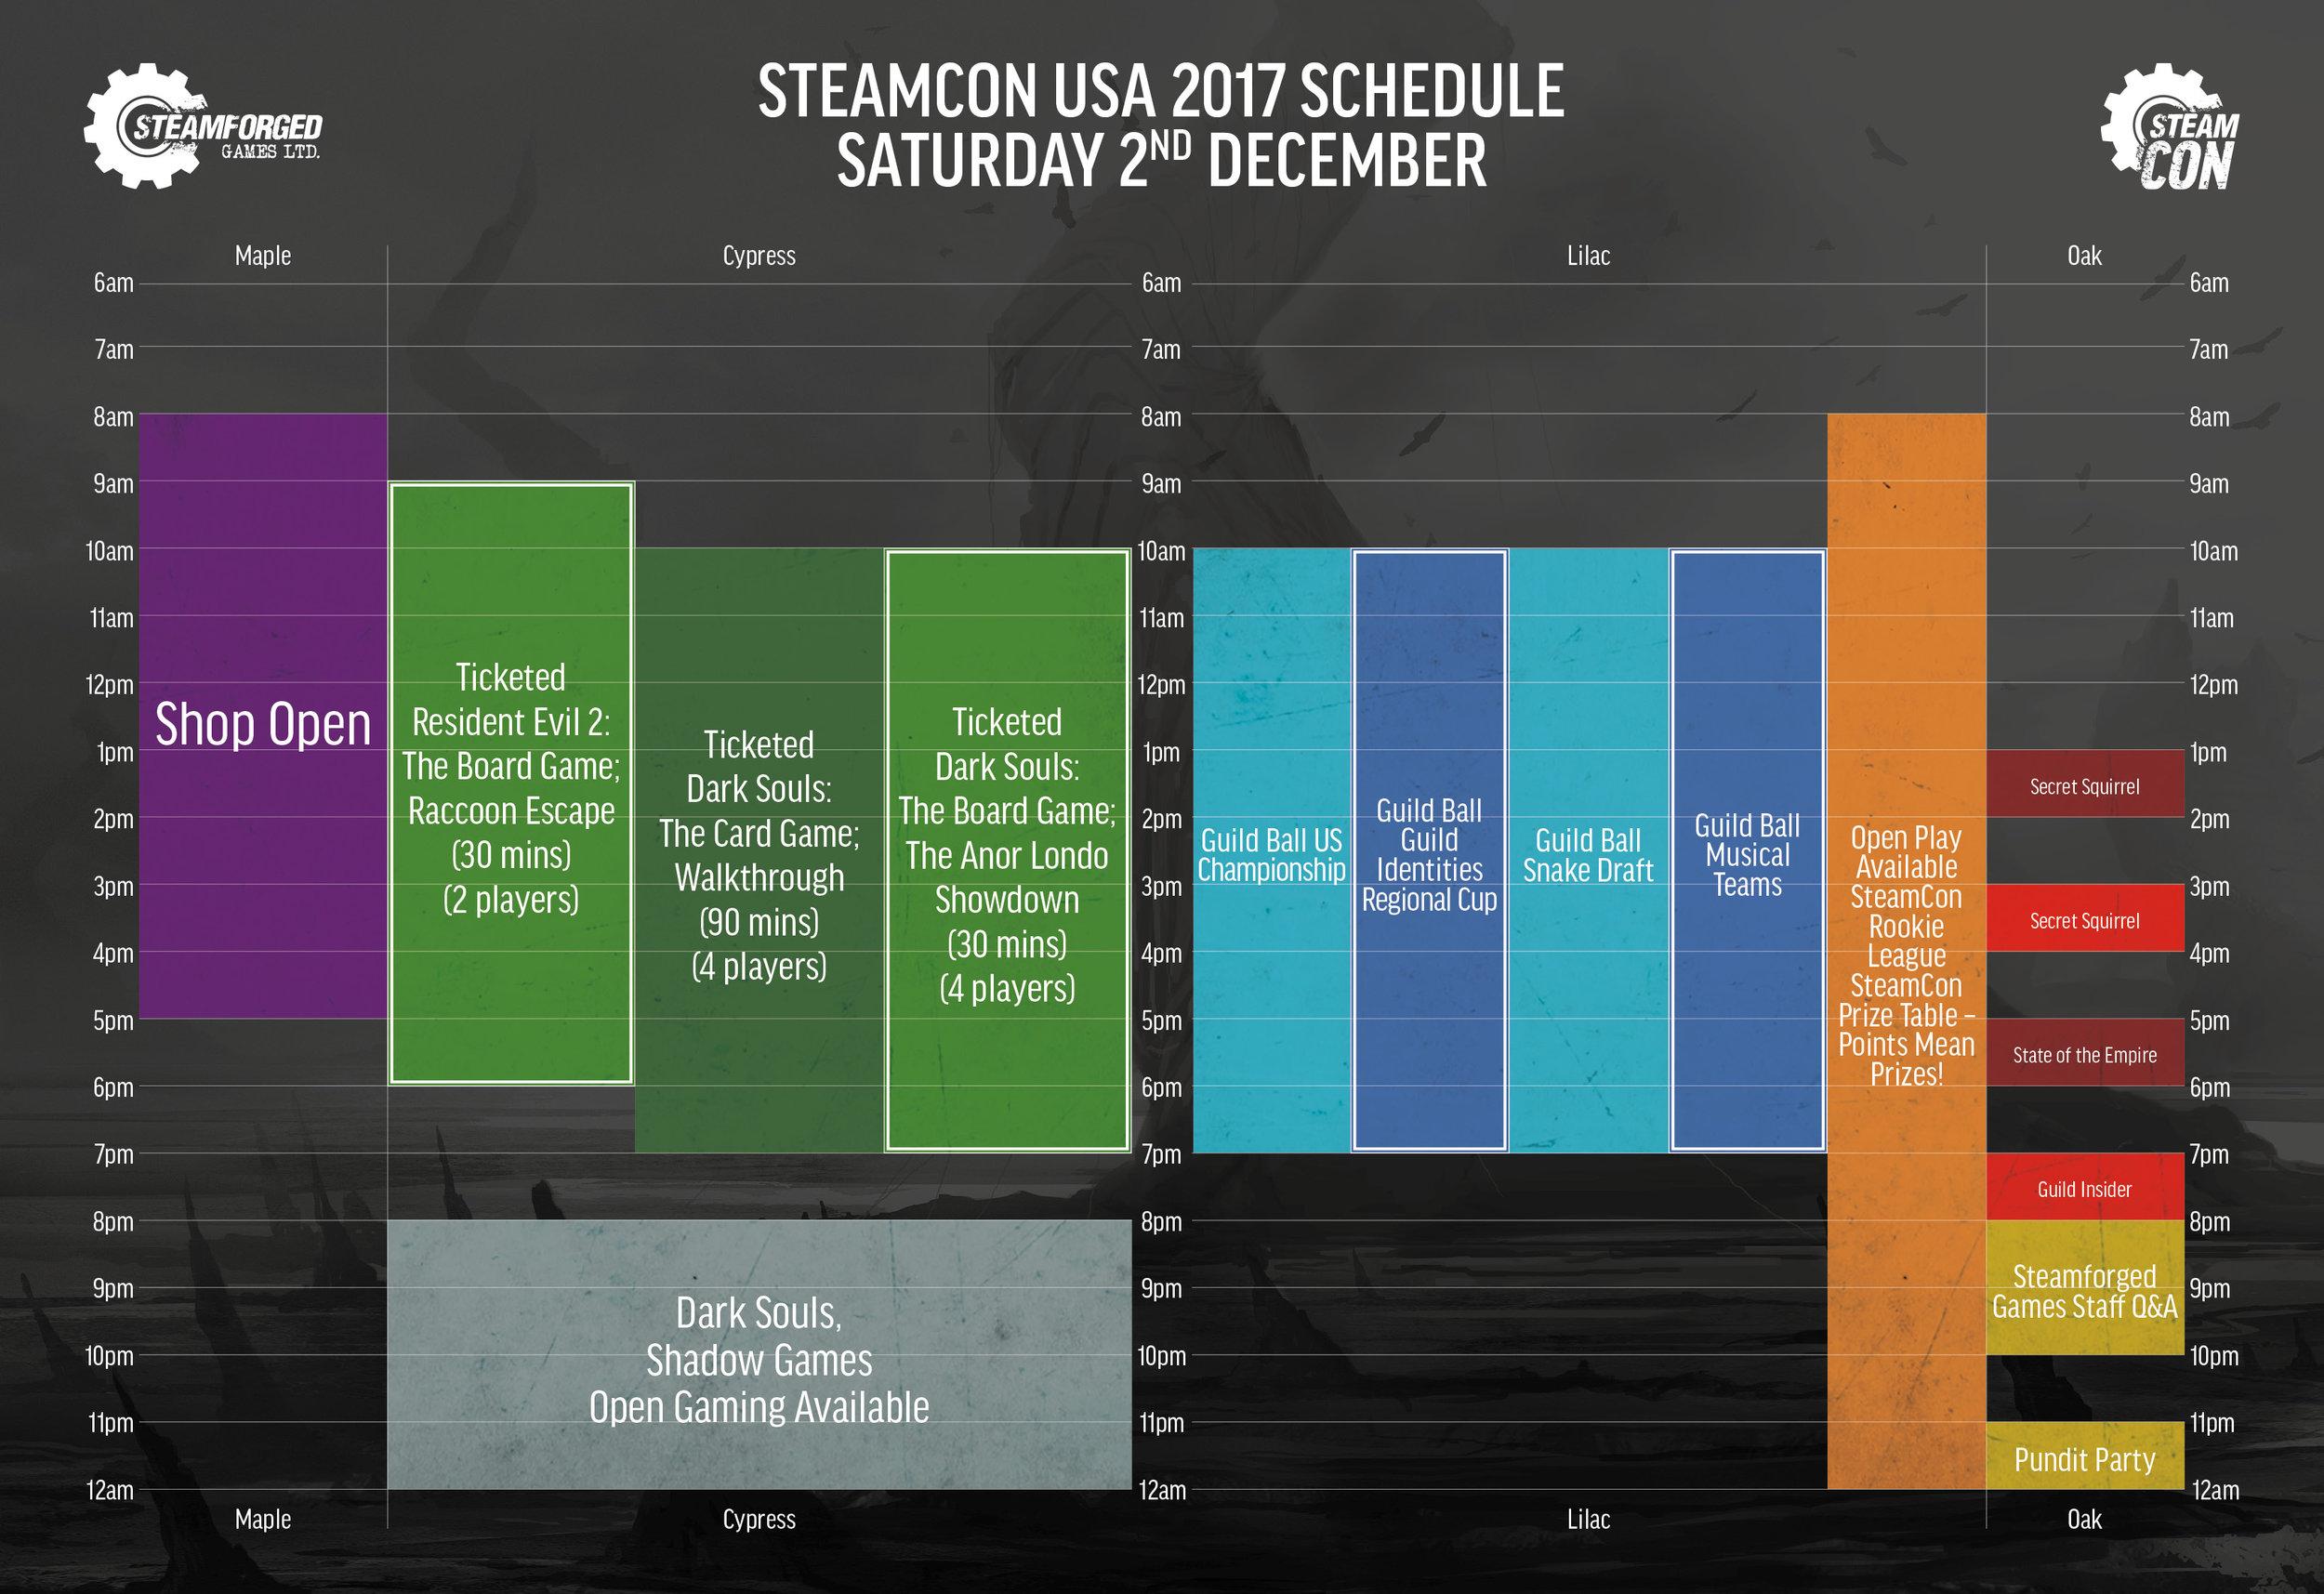 SC2017-Schedule-Web-USA.jpg